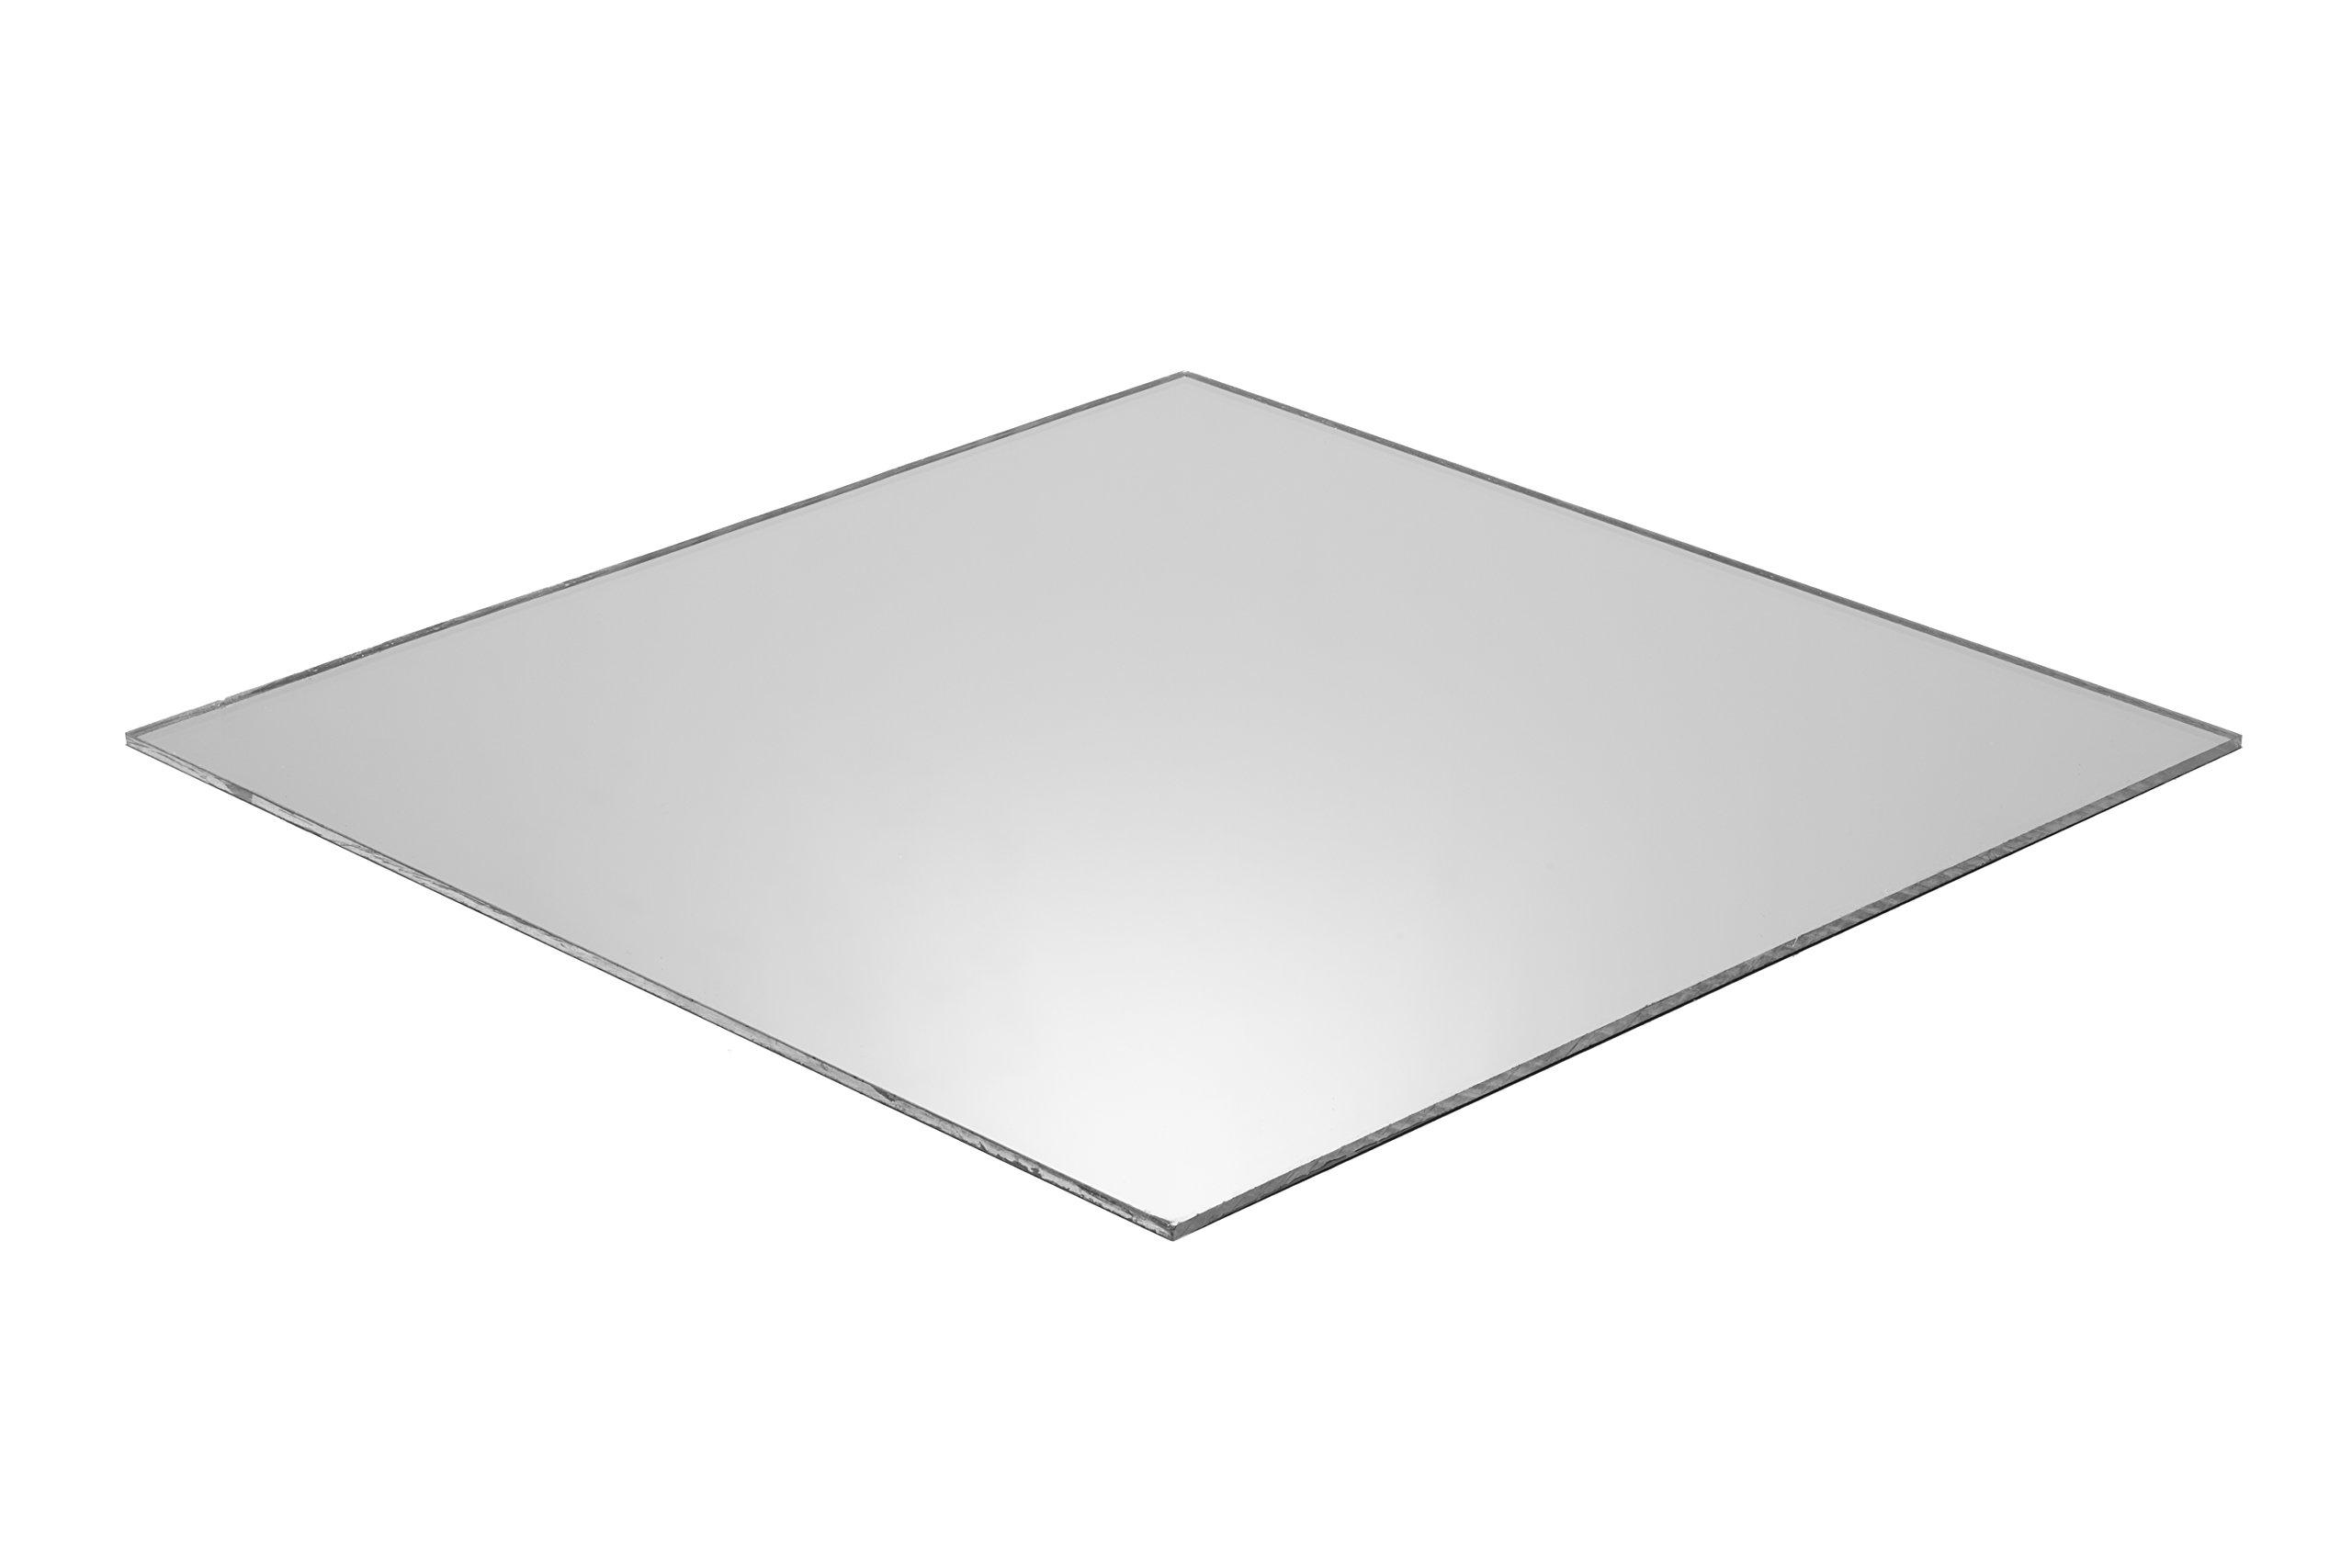 Falken Design Corporation MIR1-8/2436 Plastic Acrylic Plexiglas Lucite Acrylic Silver Mirror Sheet, 24'' x 36'', 1/8'' Thick by Falken Design Corporation